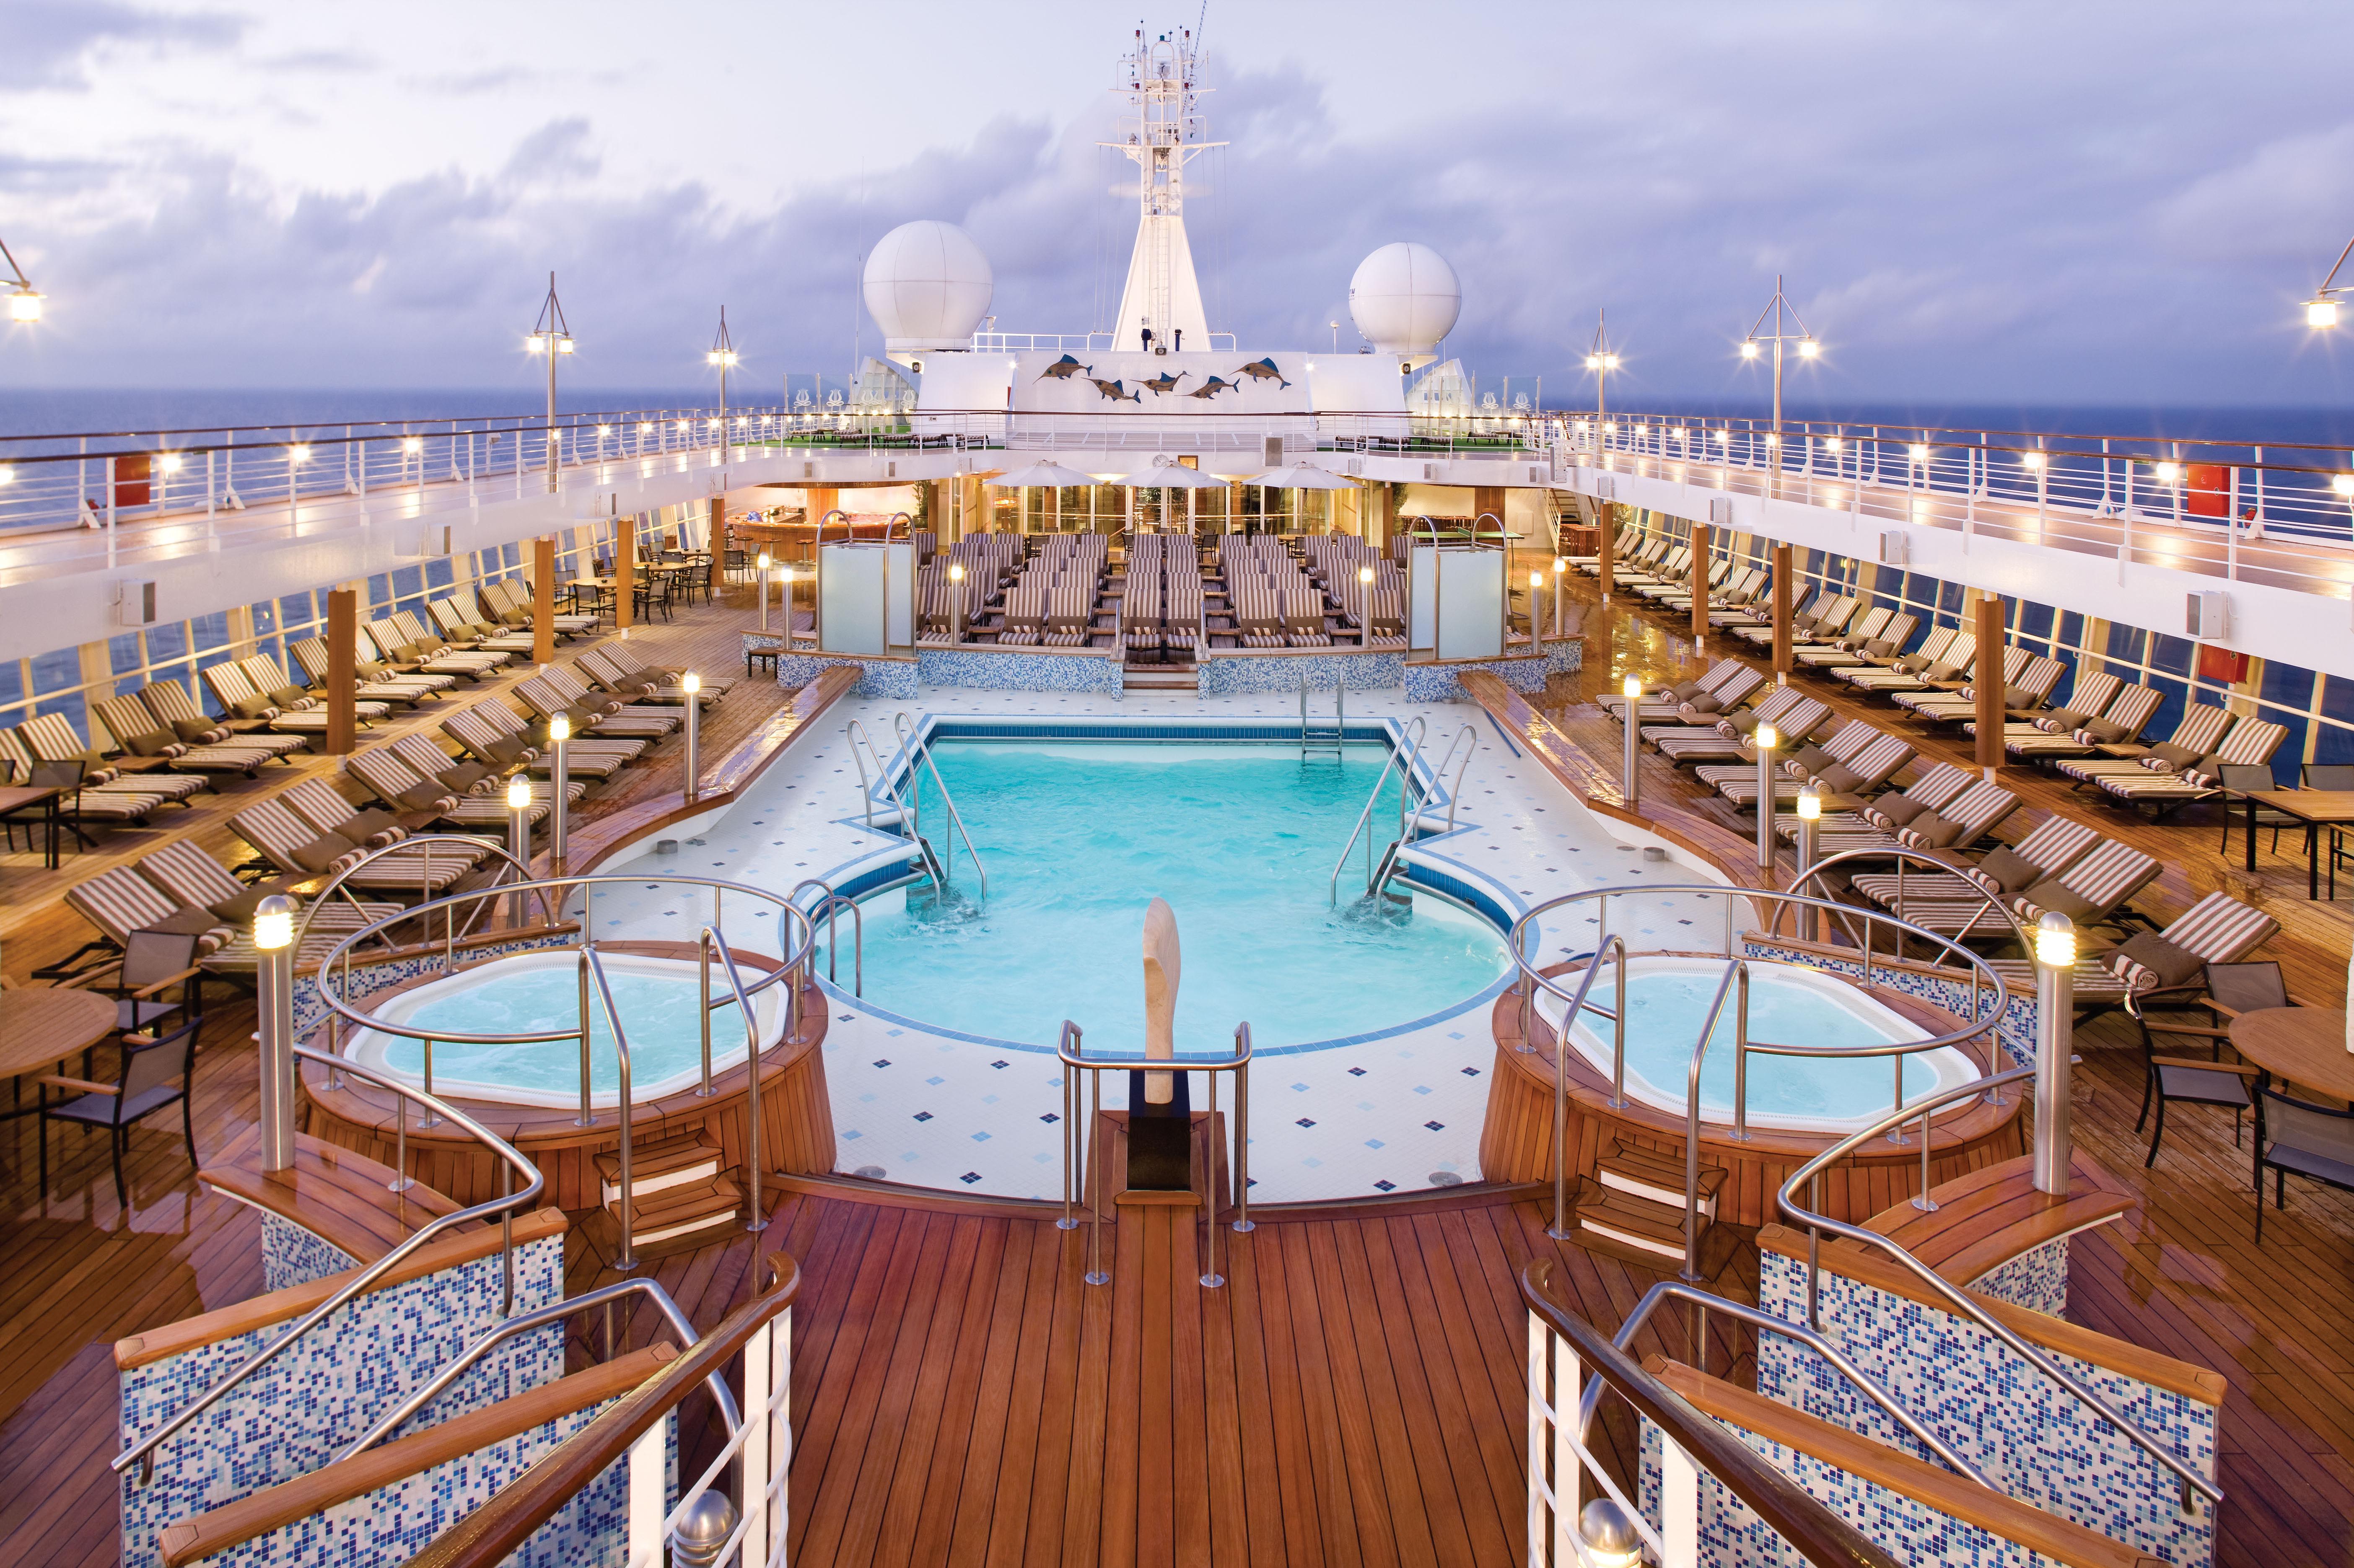 Regent Seven Seas Voyage Pool Deck